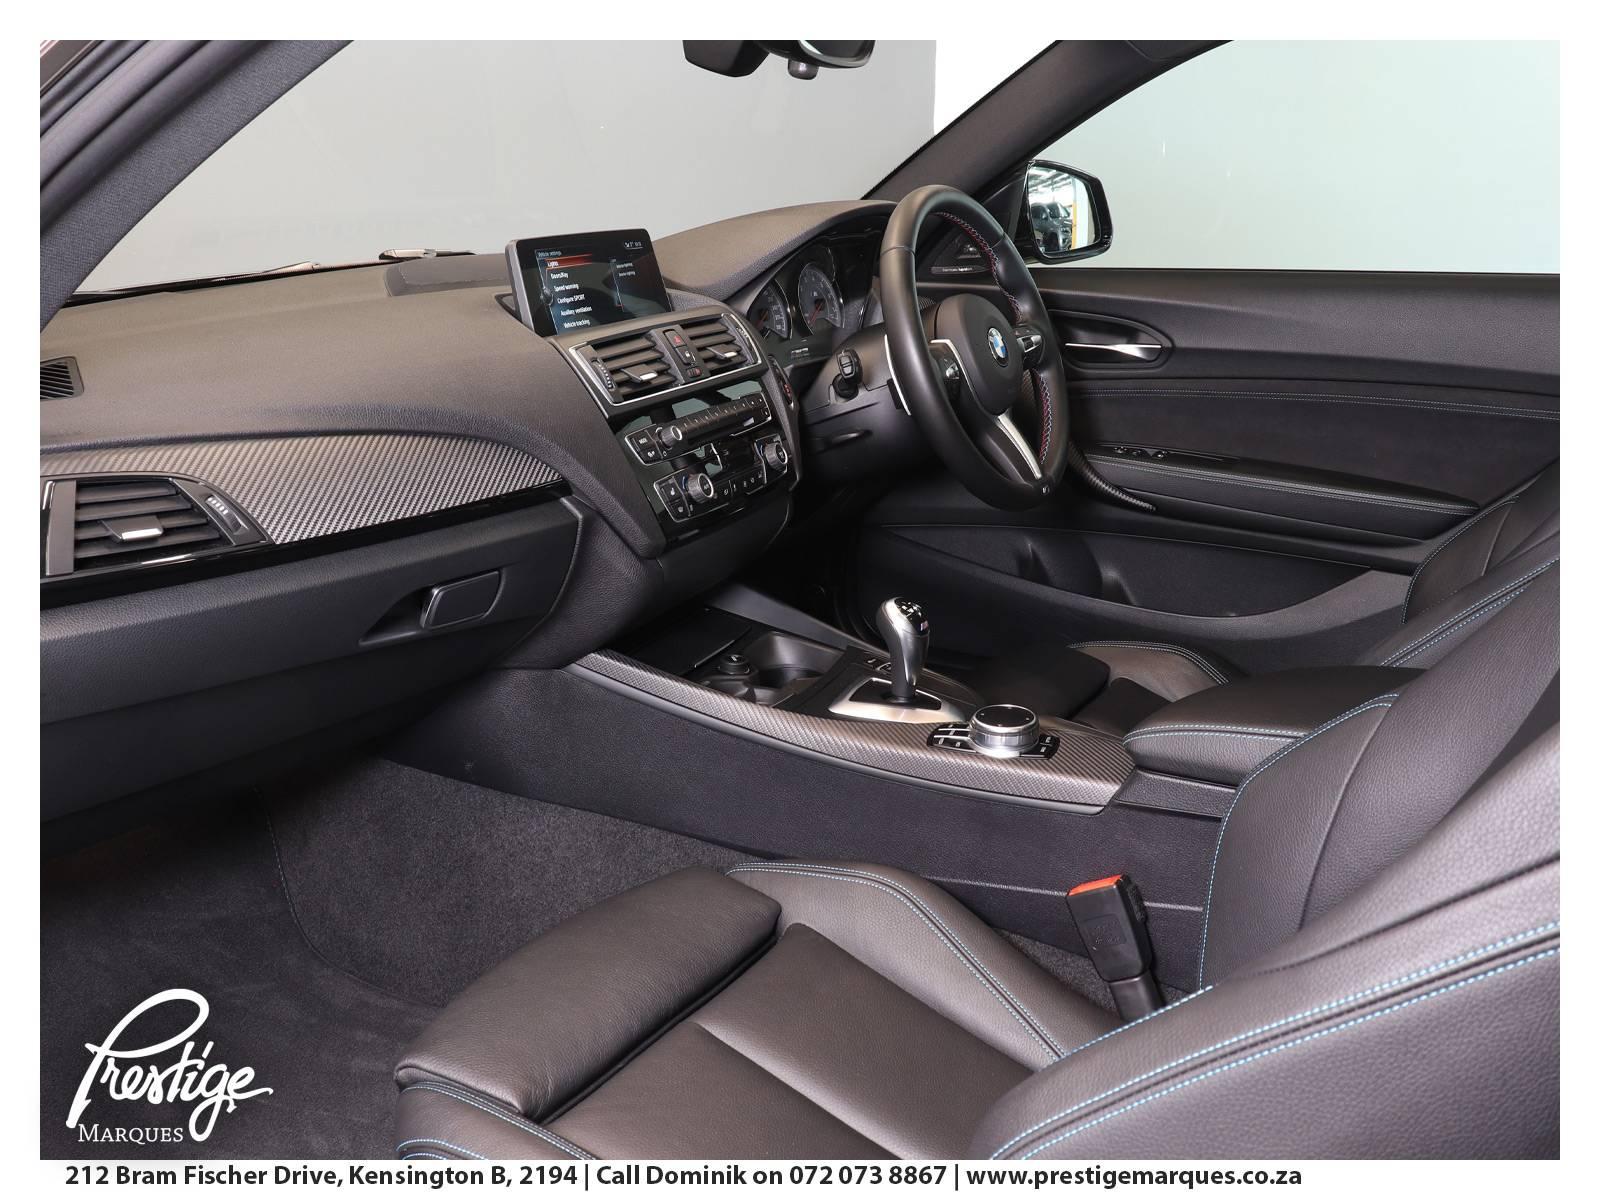 2017-BMW-M2-Coupe-Prestige-Marques-Randburg-Sandton-13